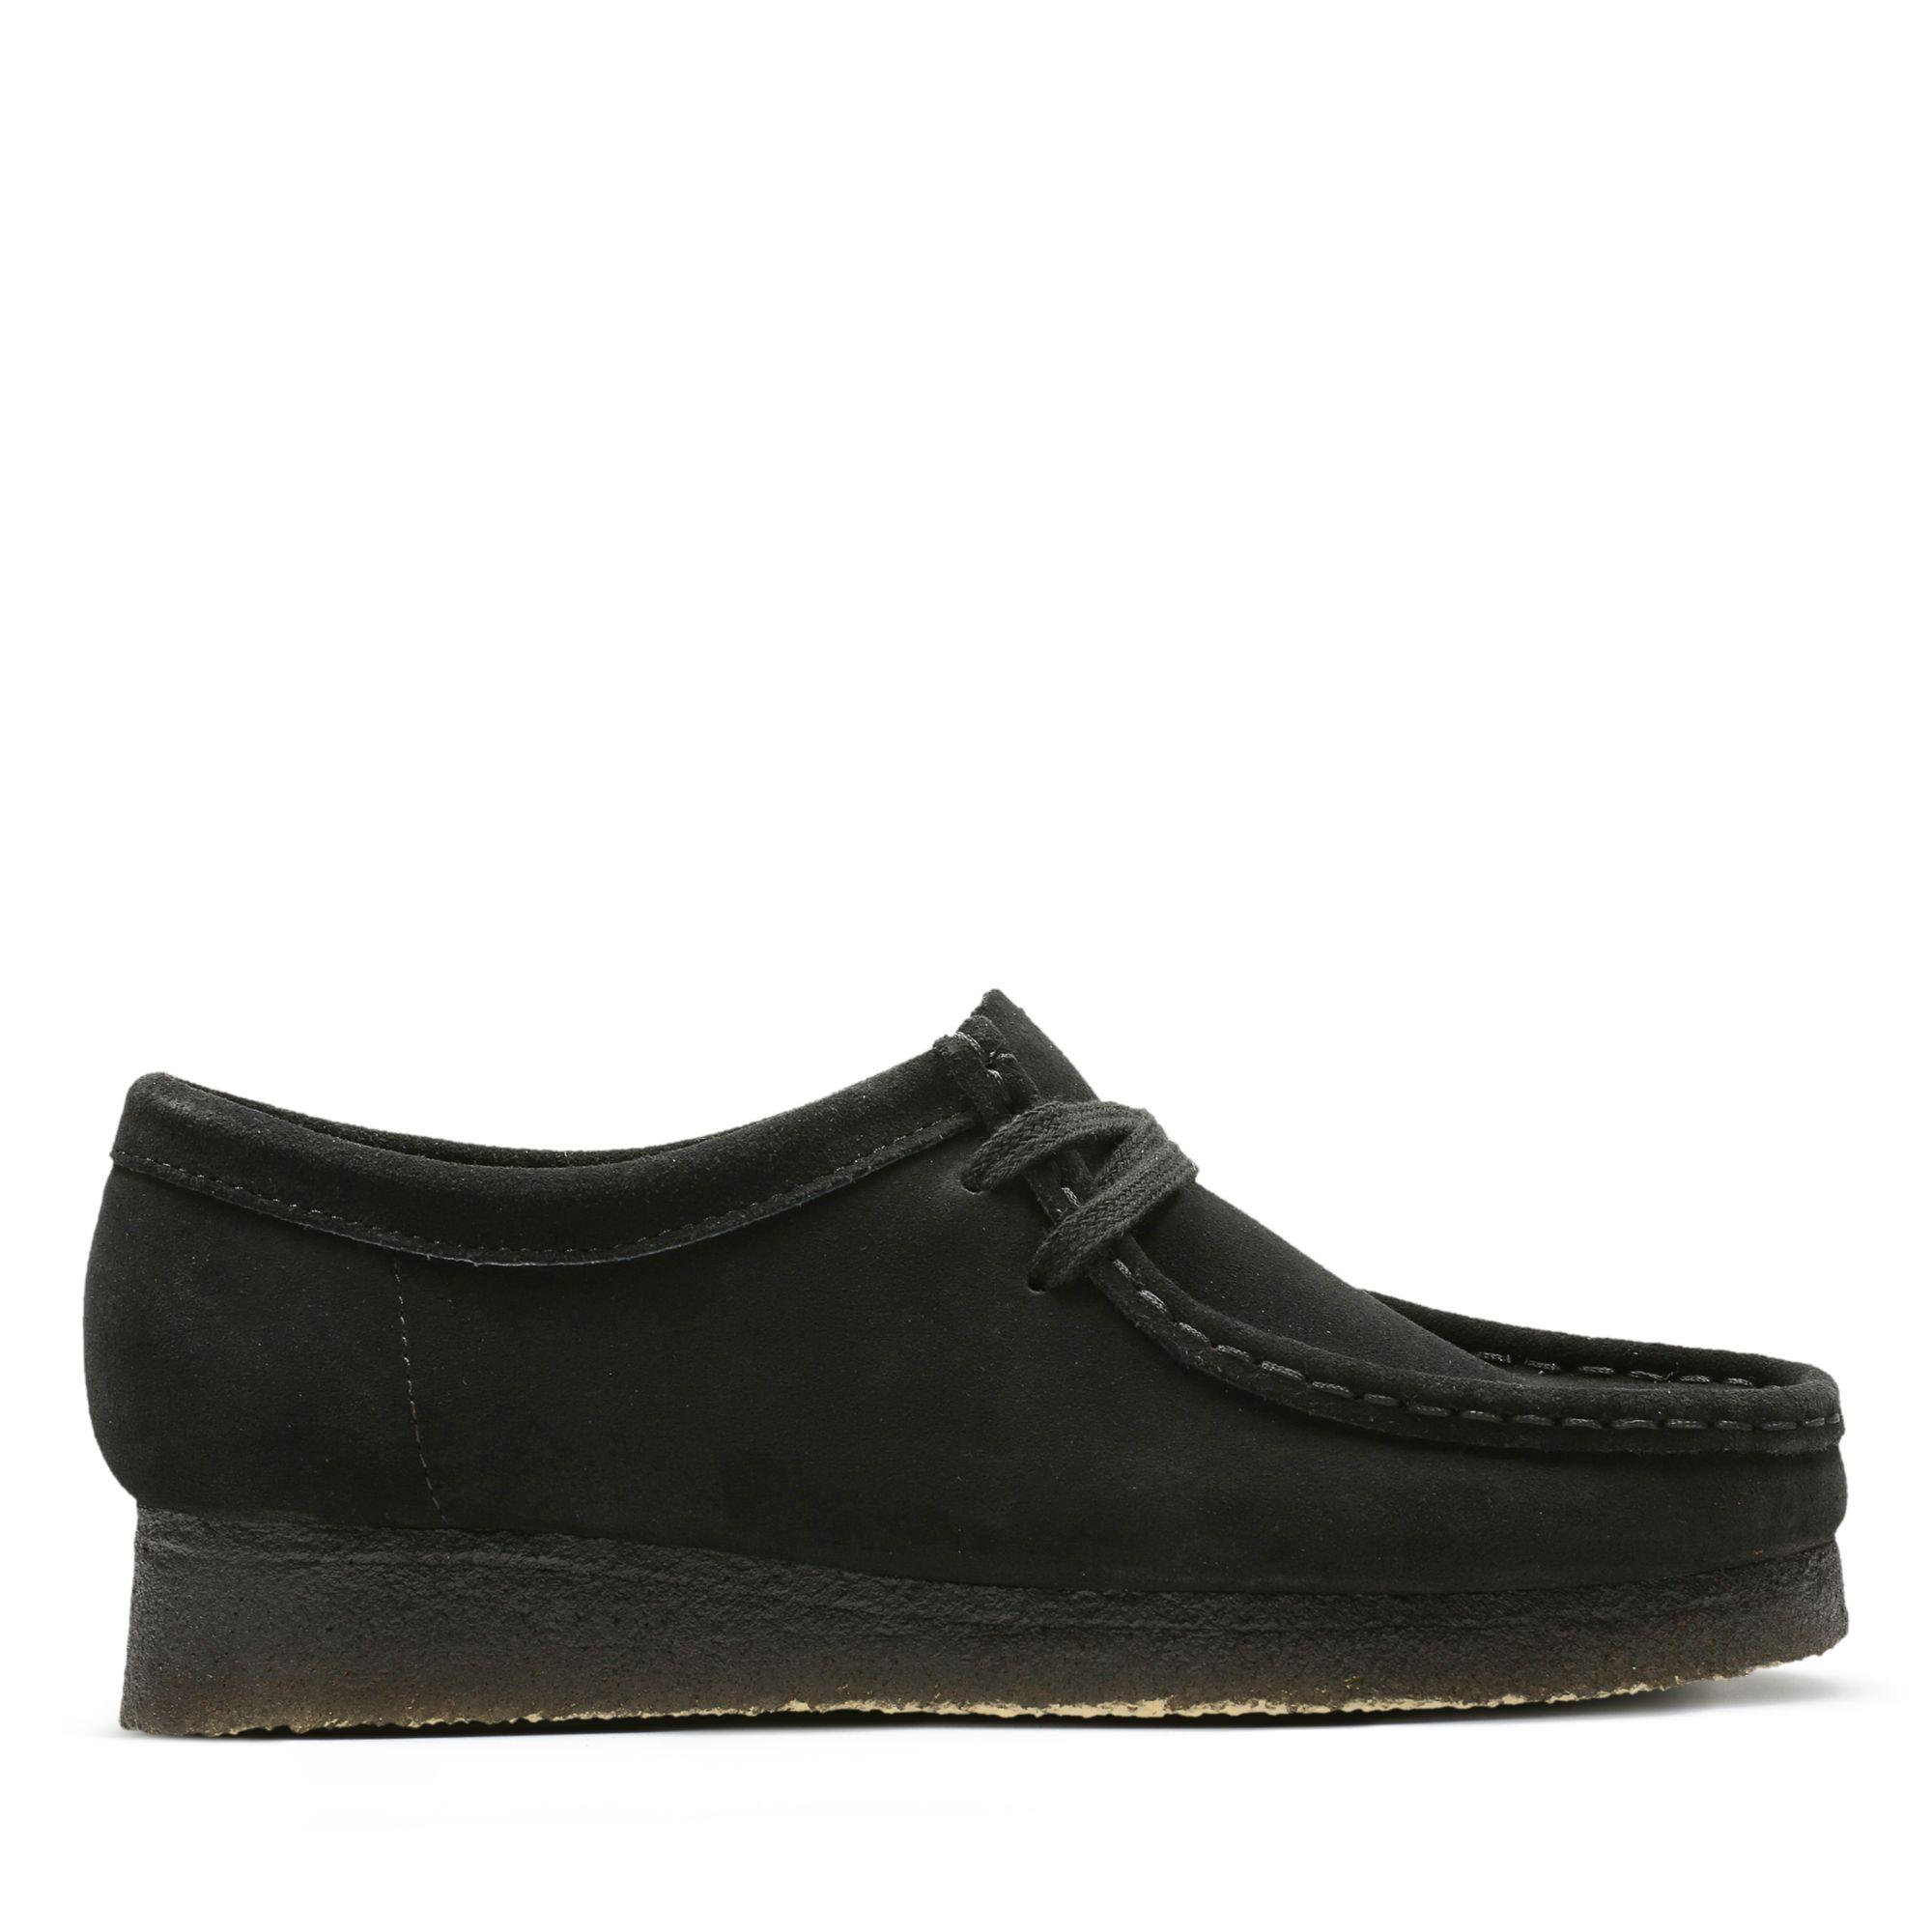 Mens Vintage Style Shoes| Retro Classic Shoes Wallabee £110.00 AT vintagedancer.com